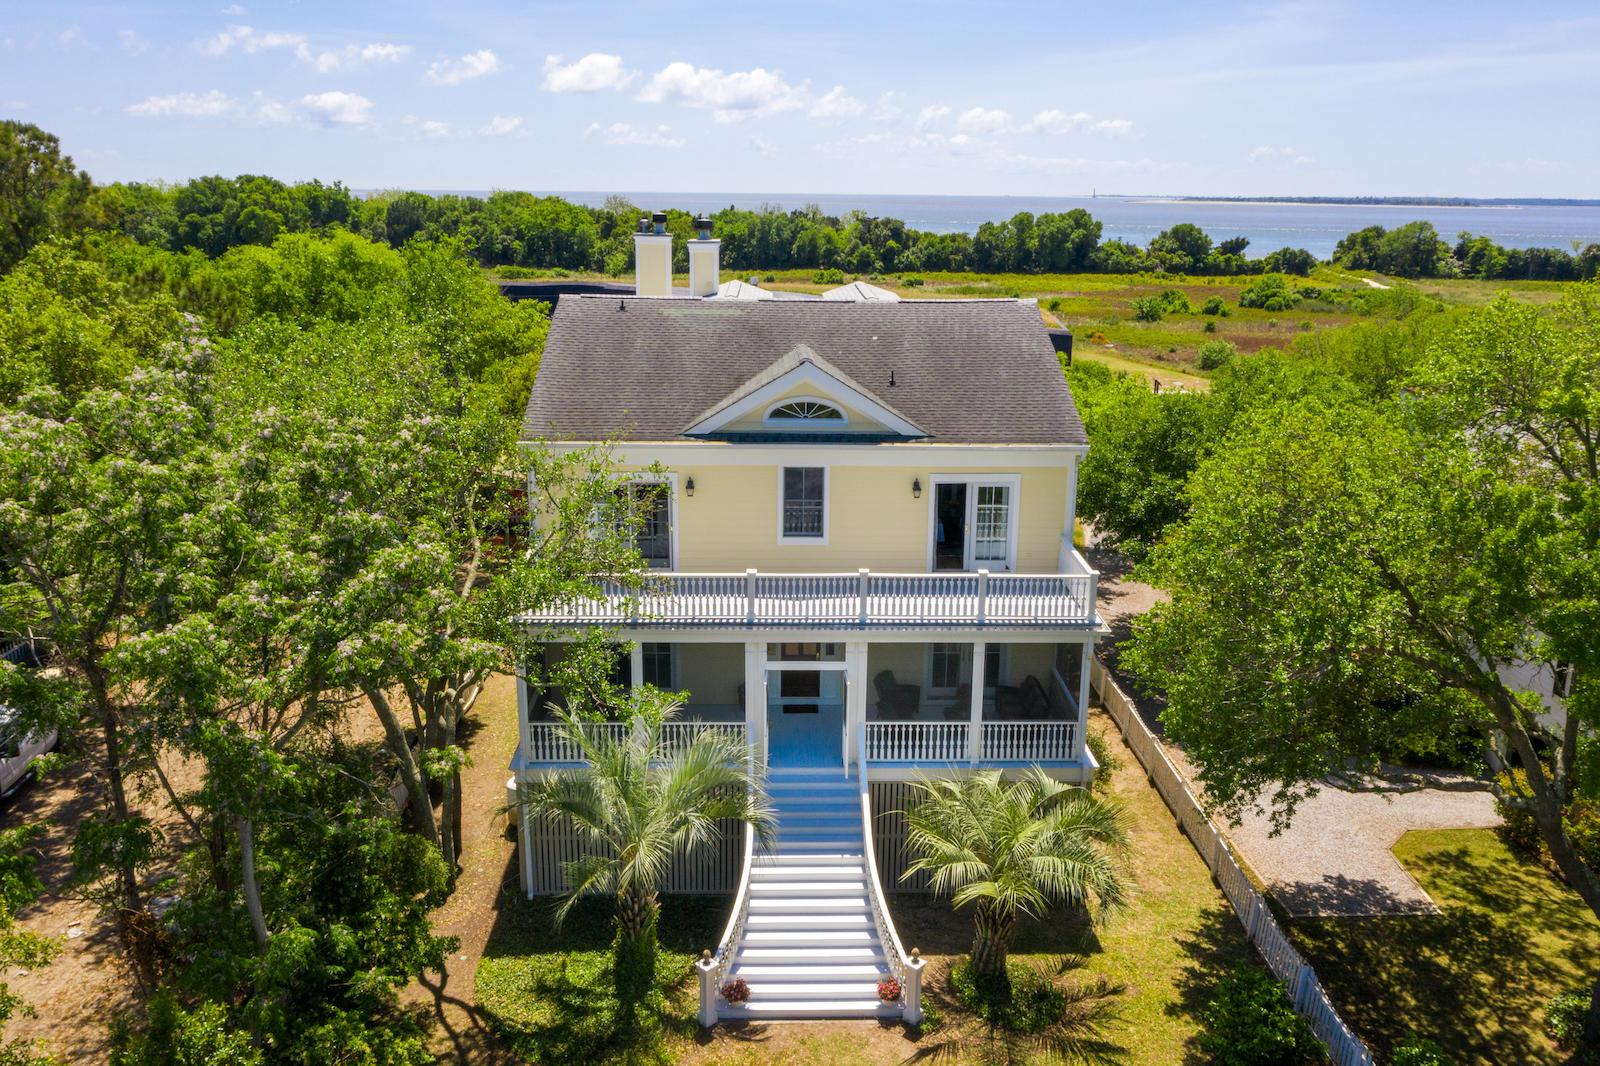 Sullivans Island Homes For Sale - 1318 Poe, Sullivans Island, SC - 22